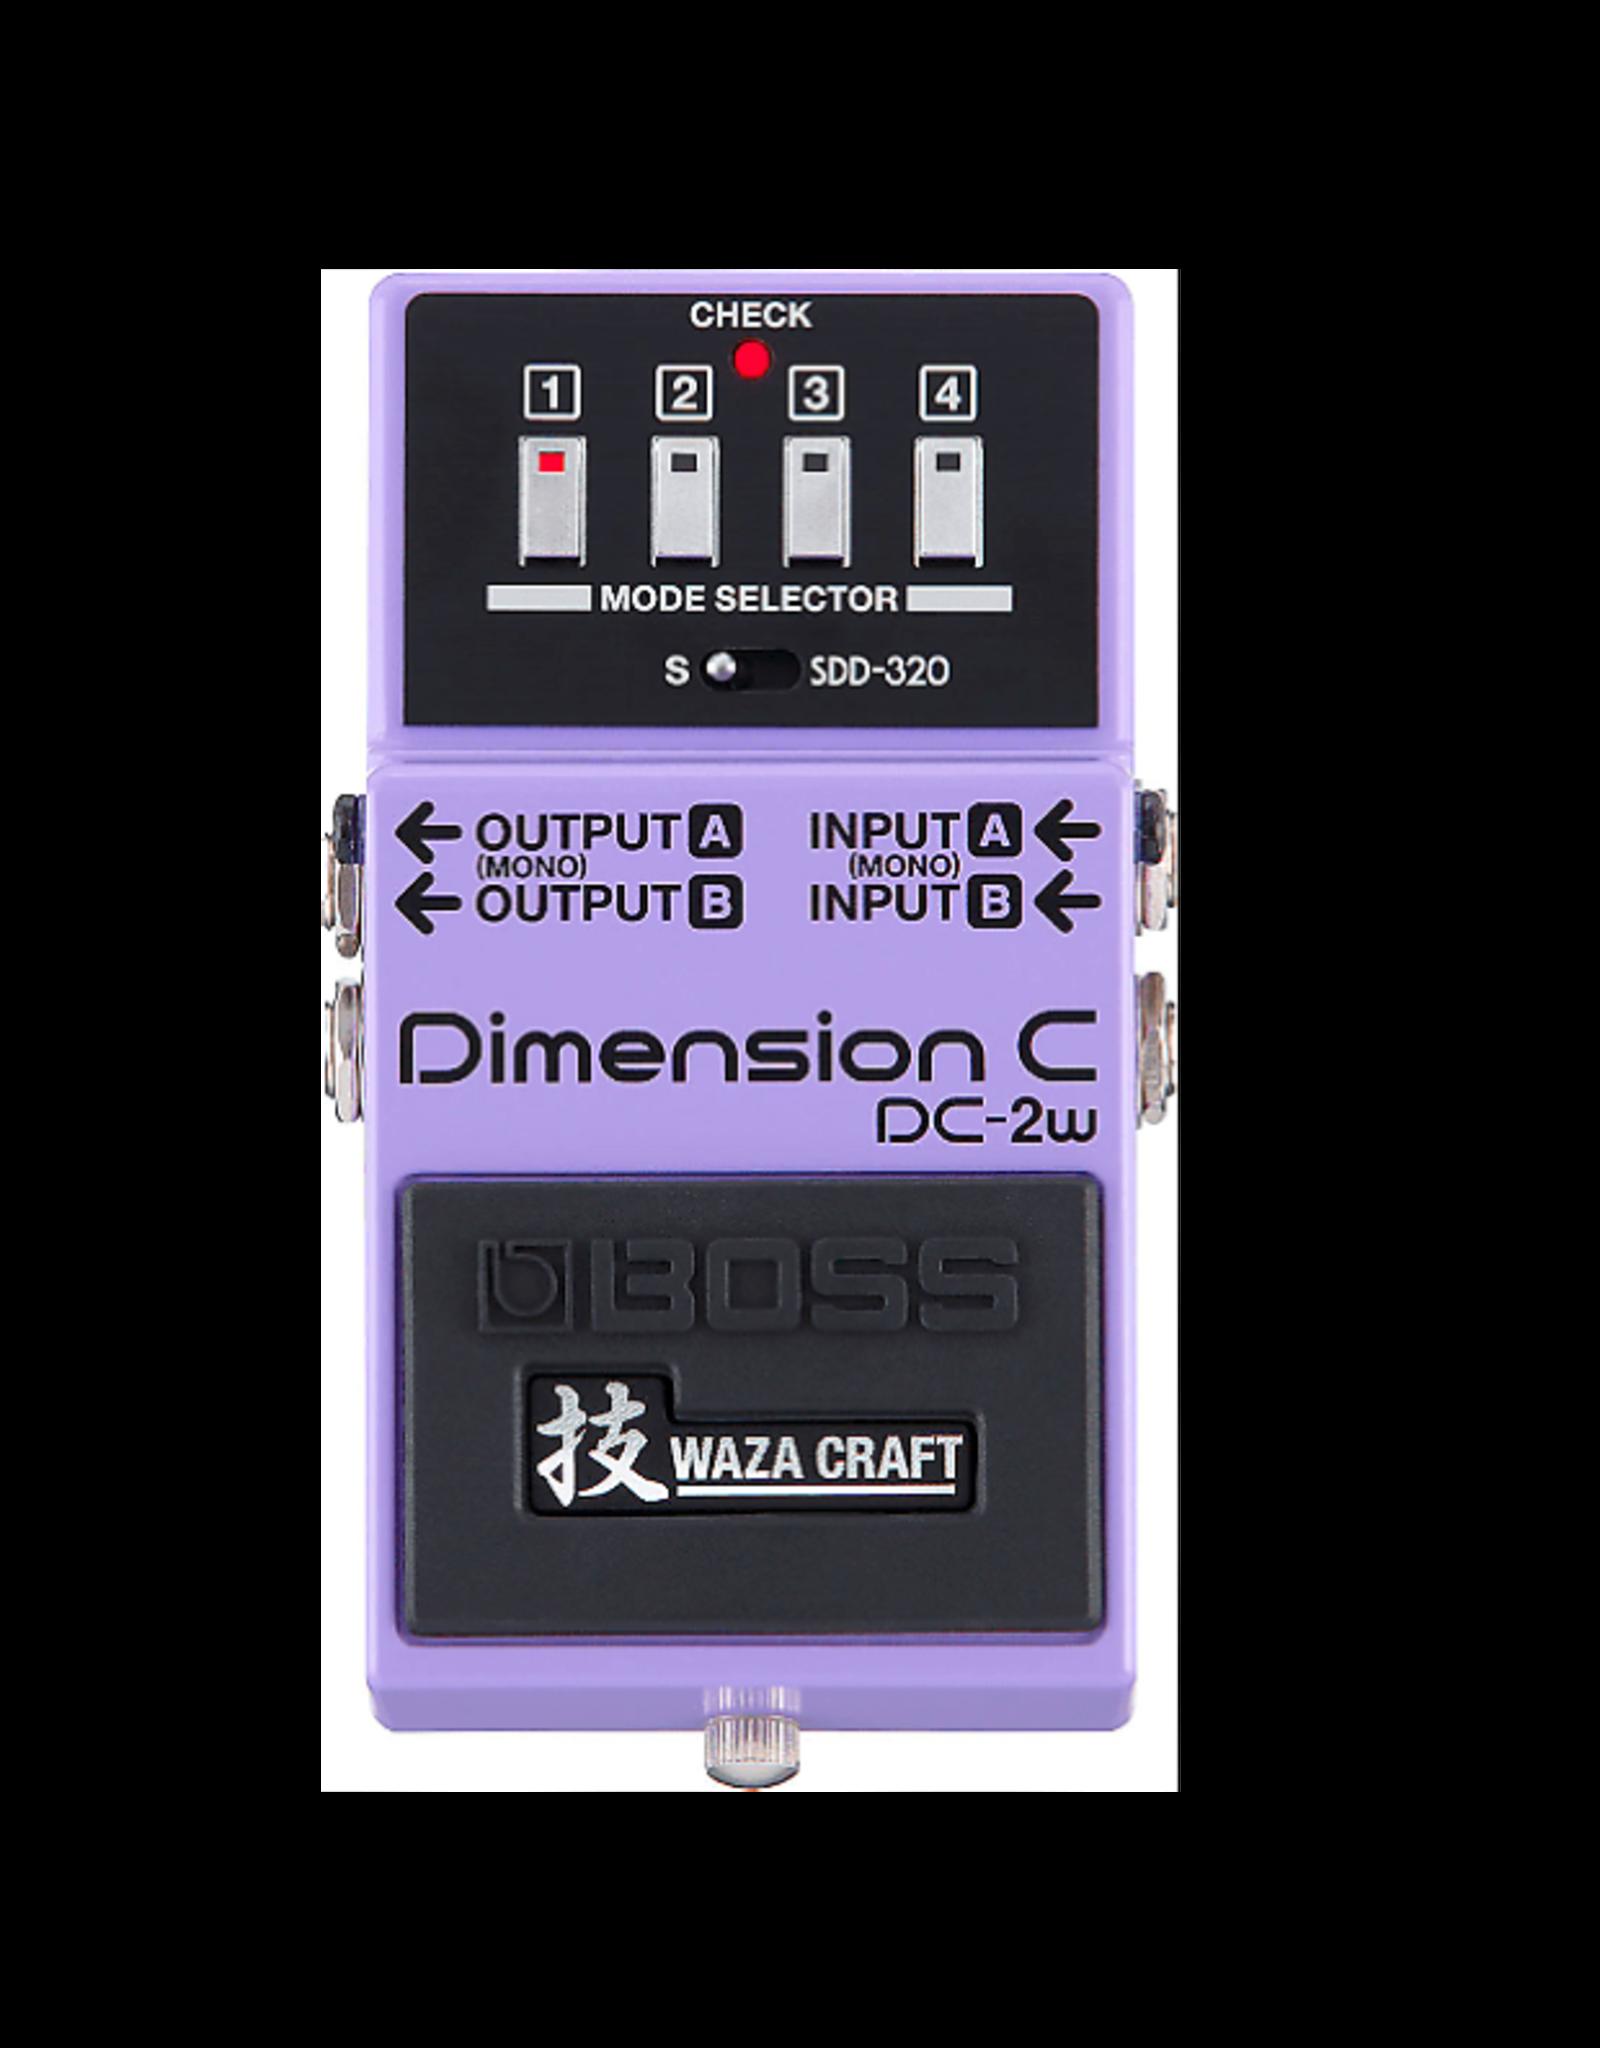 Boss Boss DC-2w Dimension C Waza Craft